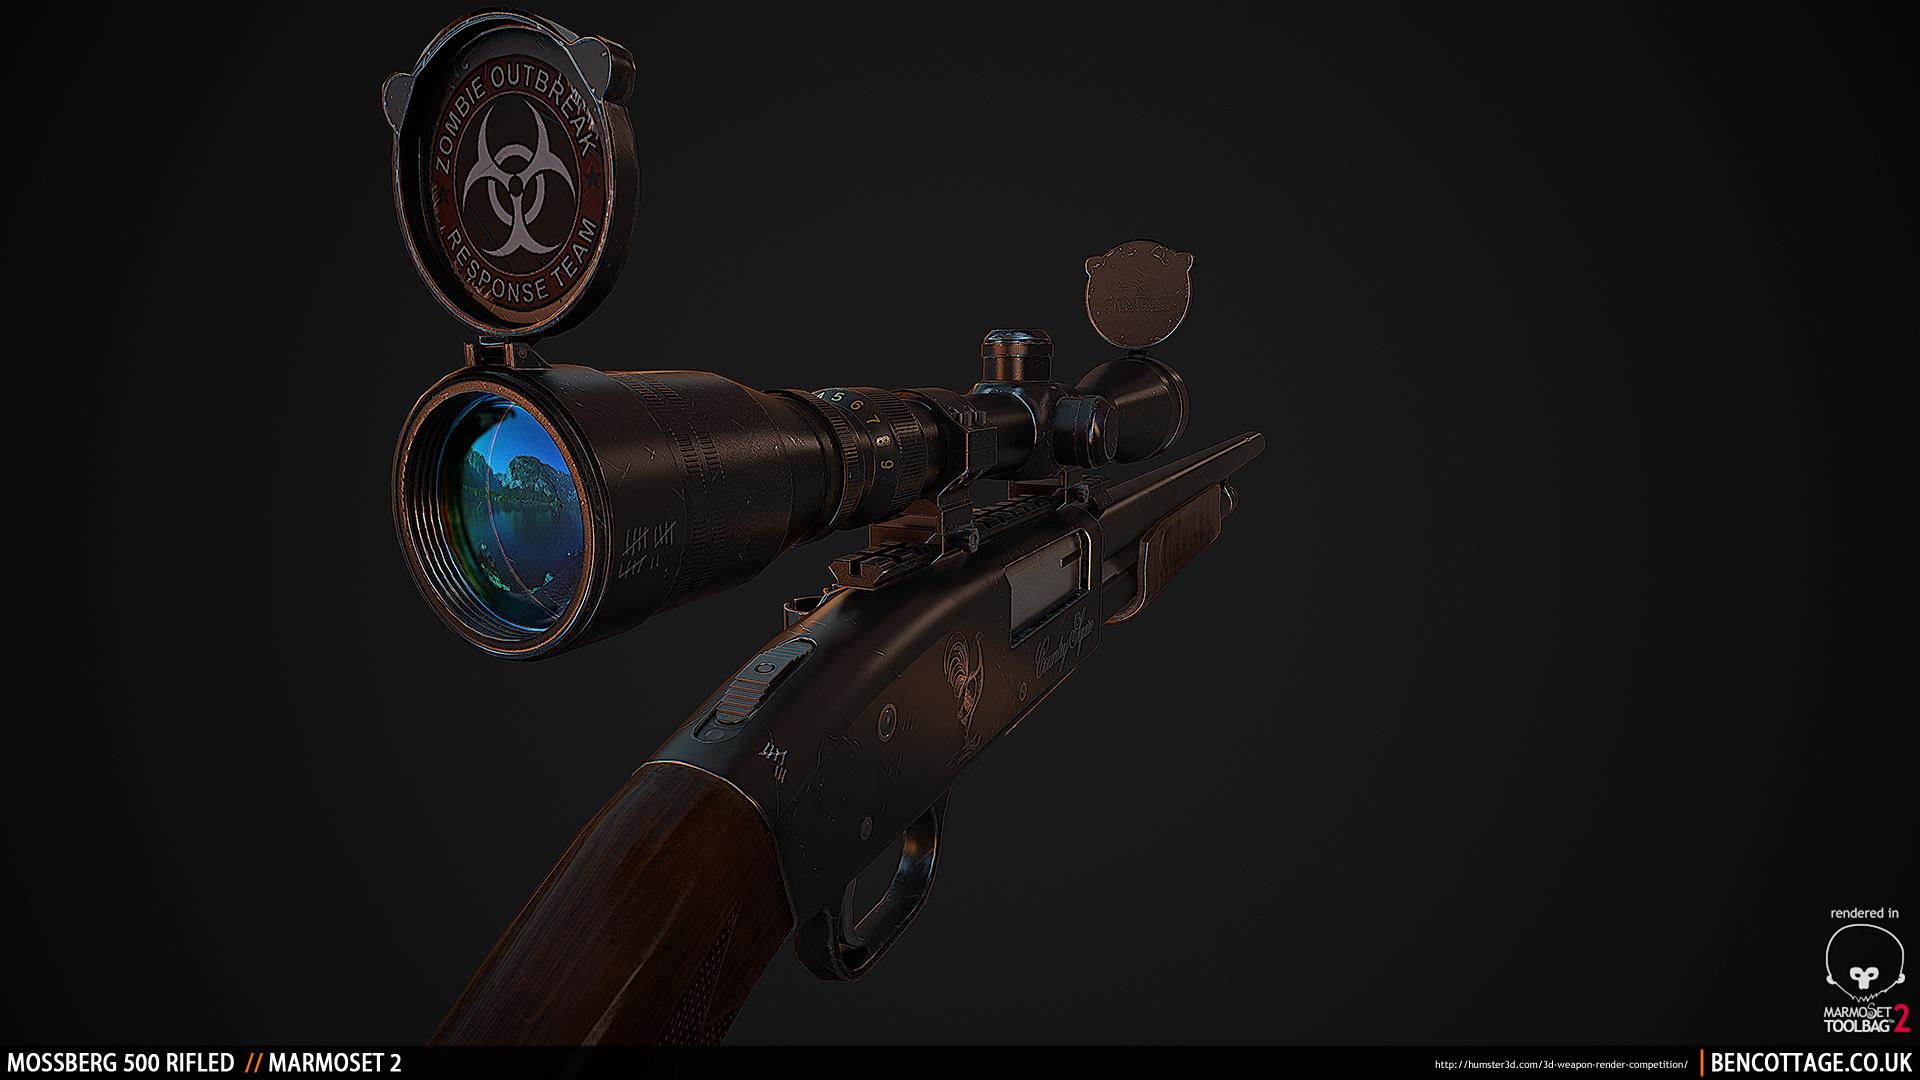 Mossberg 500 Rifled 3d art